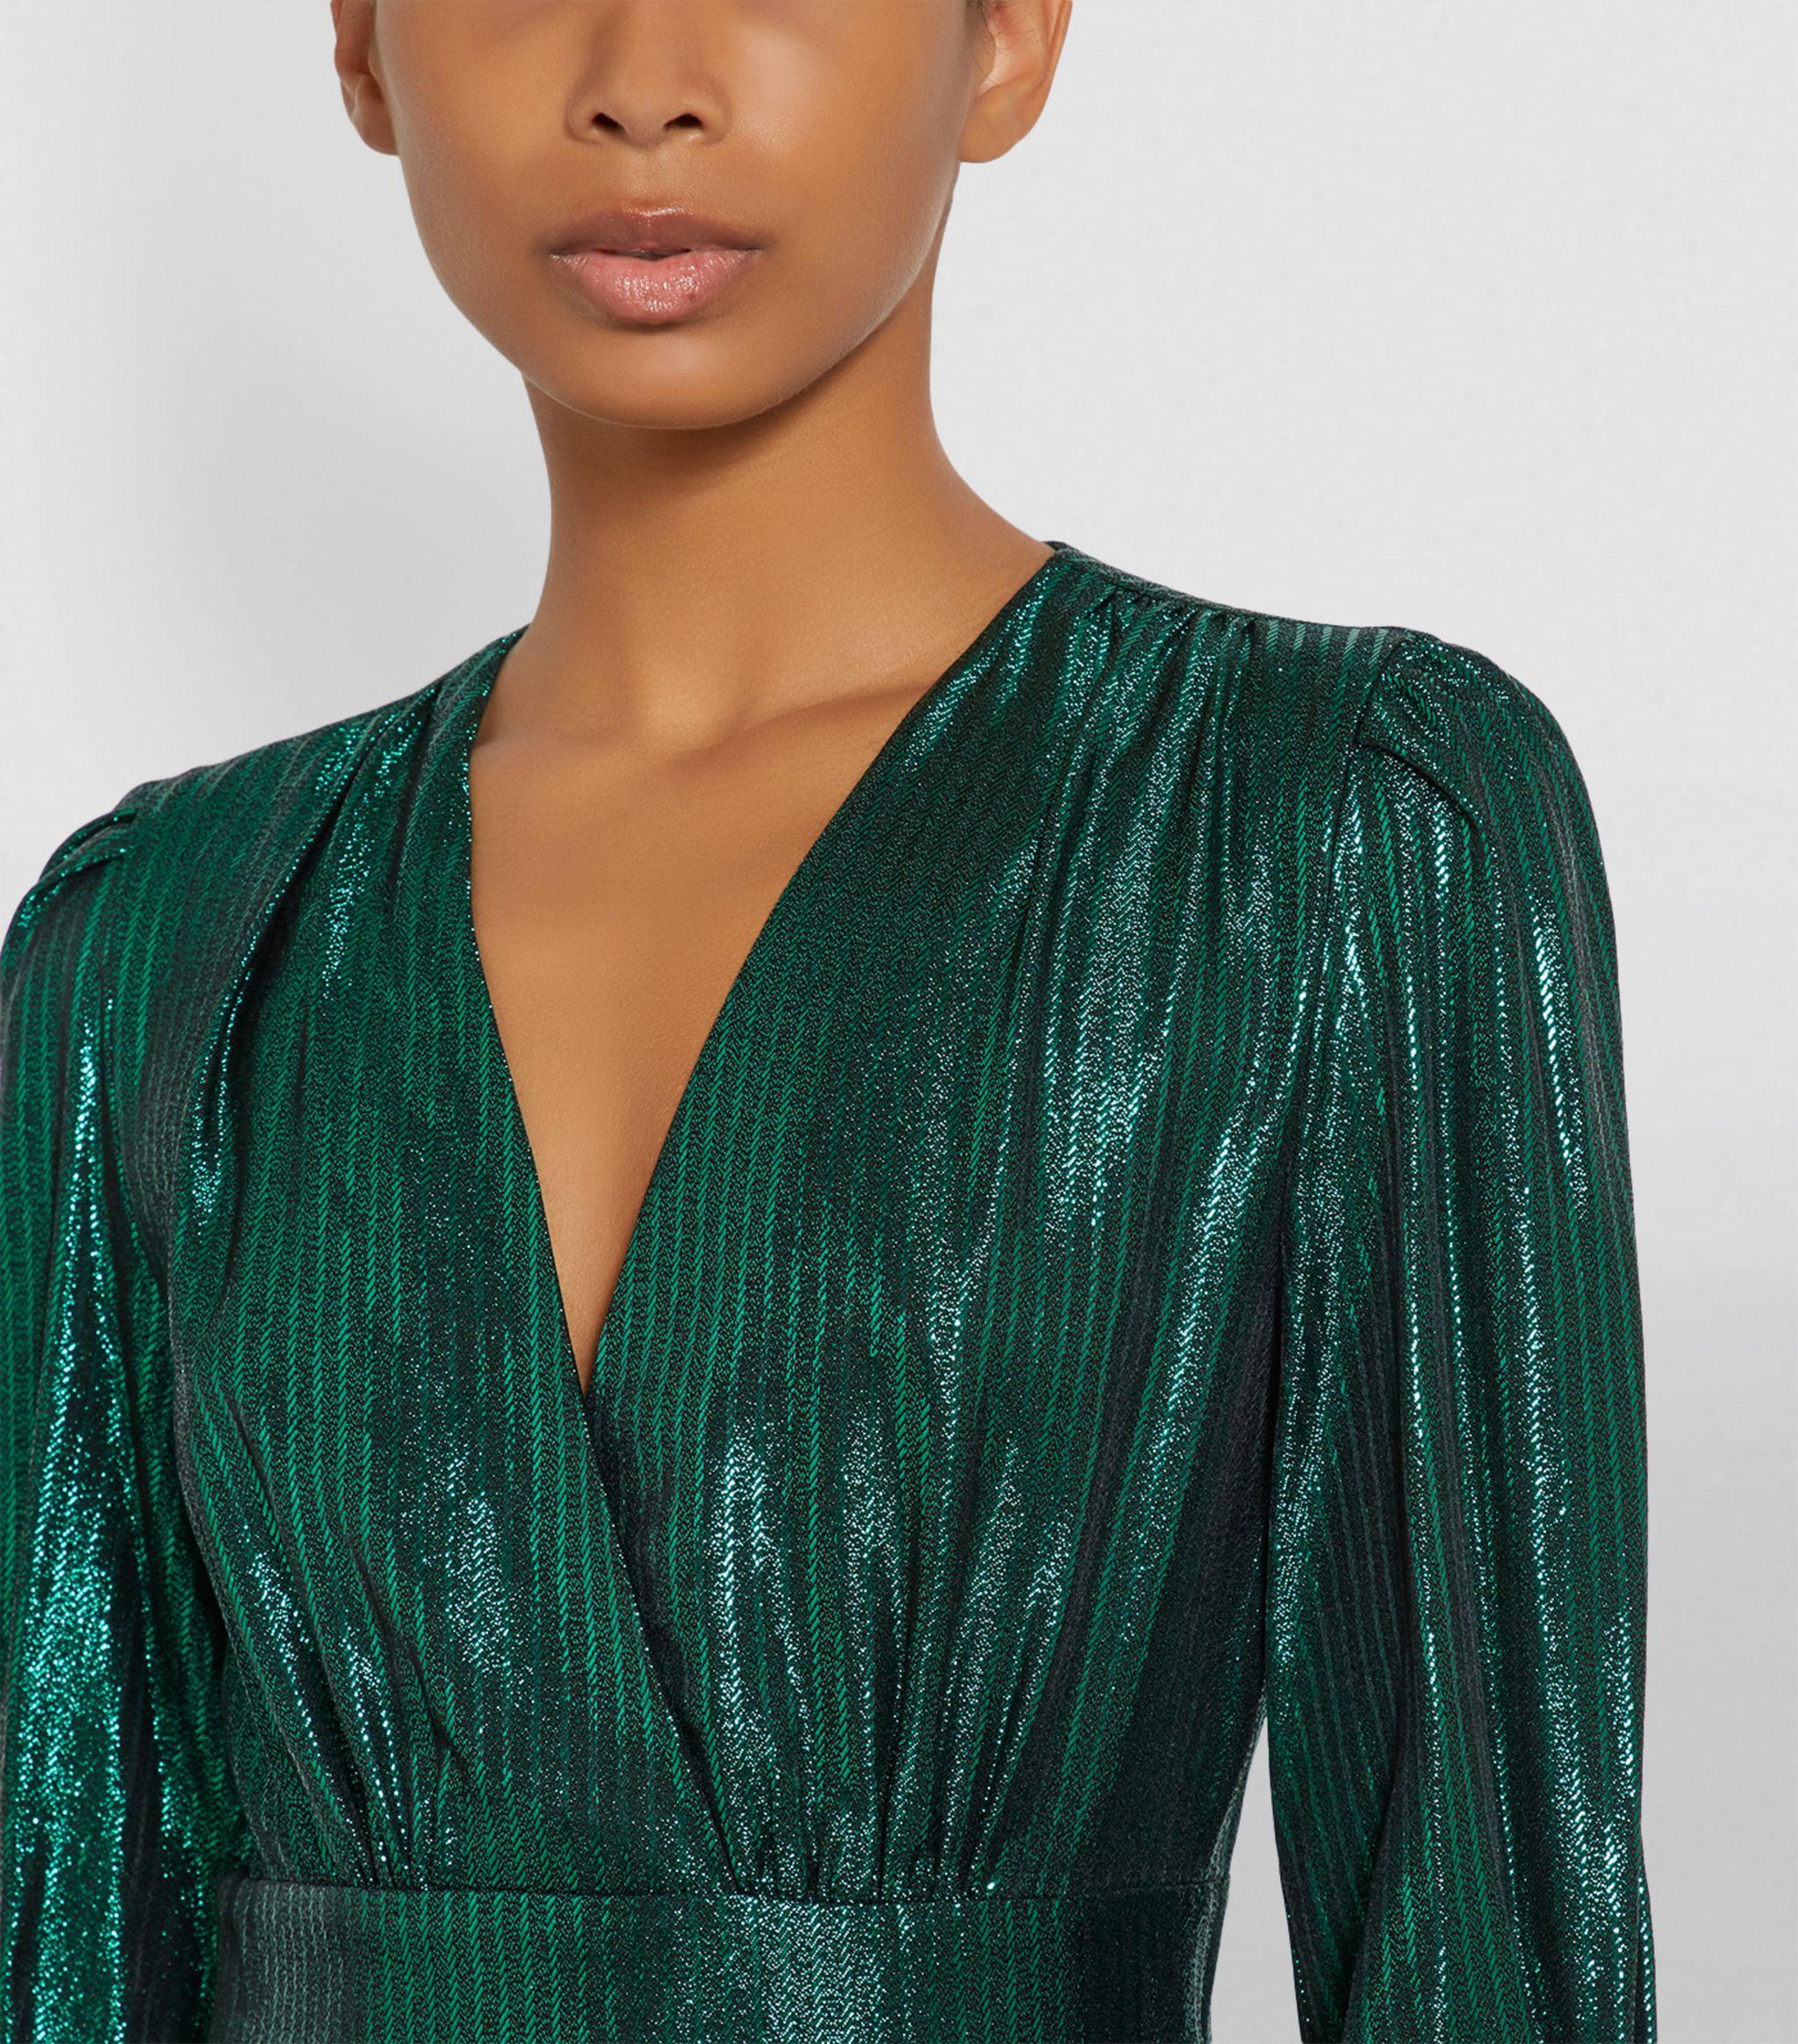 Maje Green Metallic Ruffle Dress Ad Affiliate Green Maje Metallic Dress Ruffle Ruffle Dress Maje Dress Dresses [ 2328 x 2048 Pixel ]